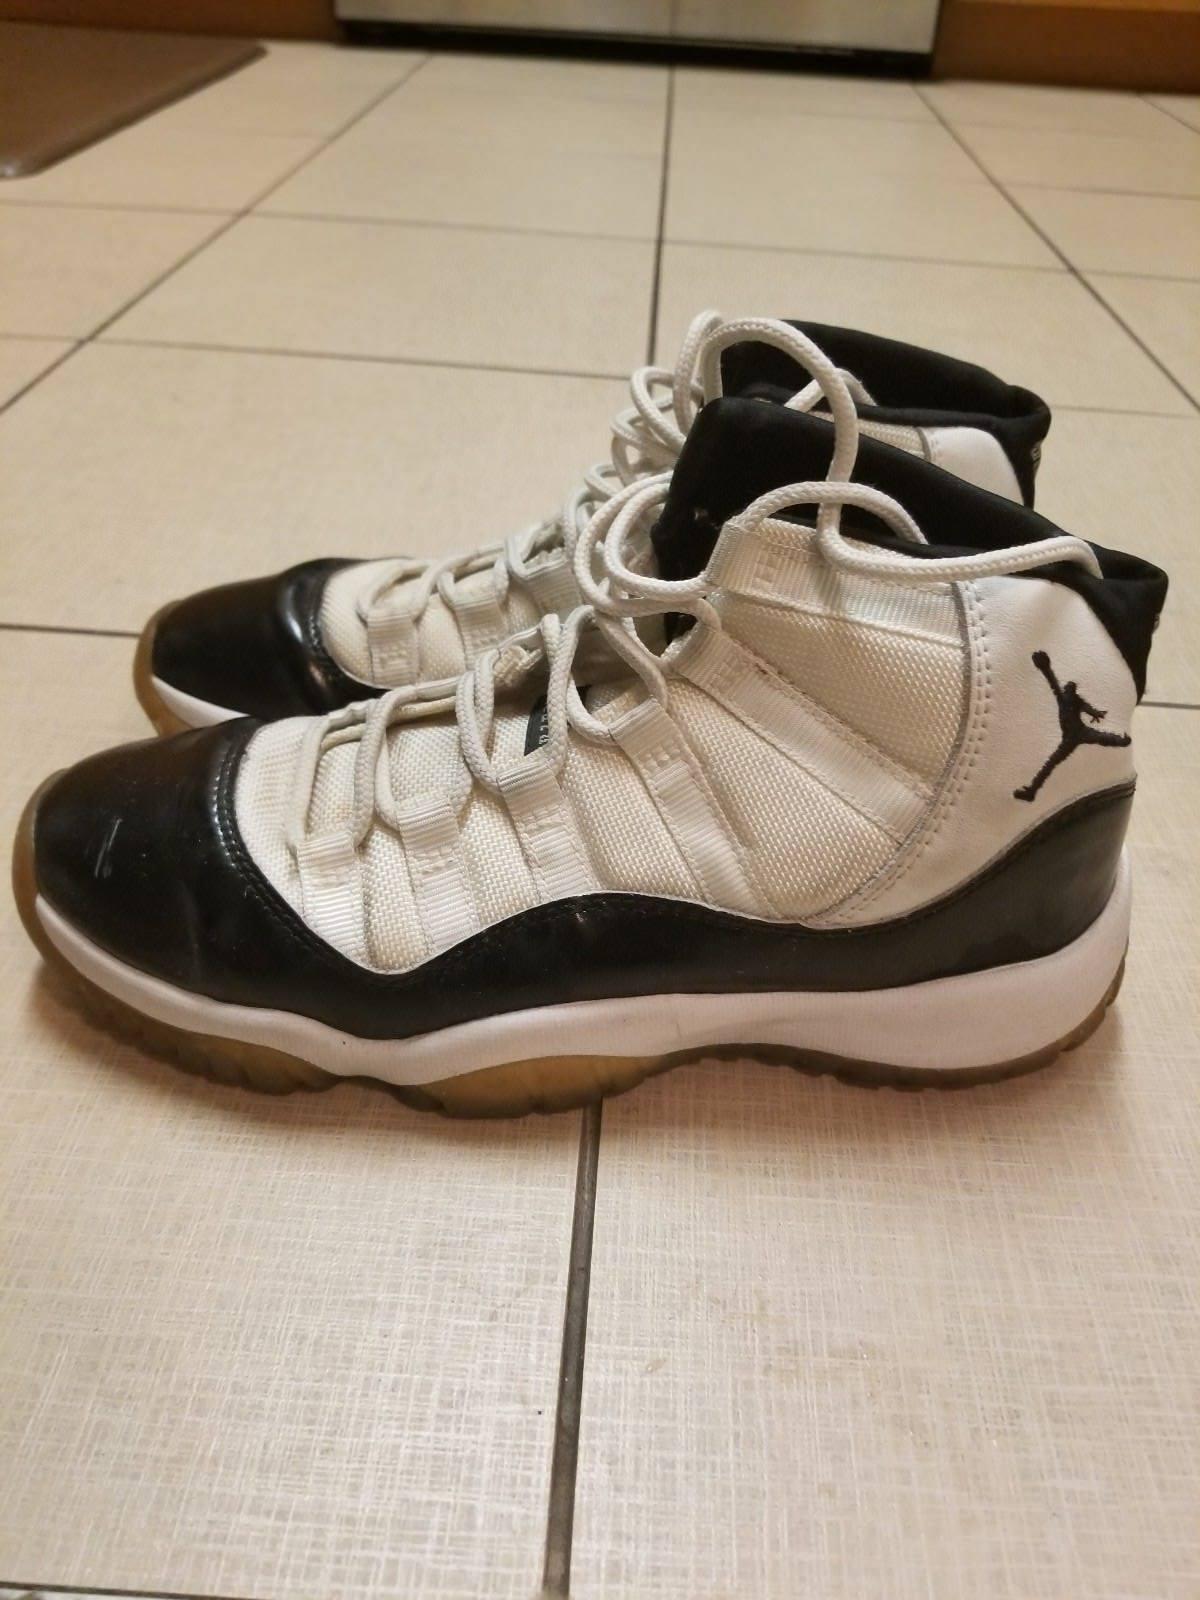 RARE 2000 Retro Nike Air Jordan Concord 11 Size 5.5 WHITE BLACK blueE